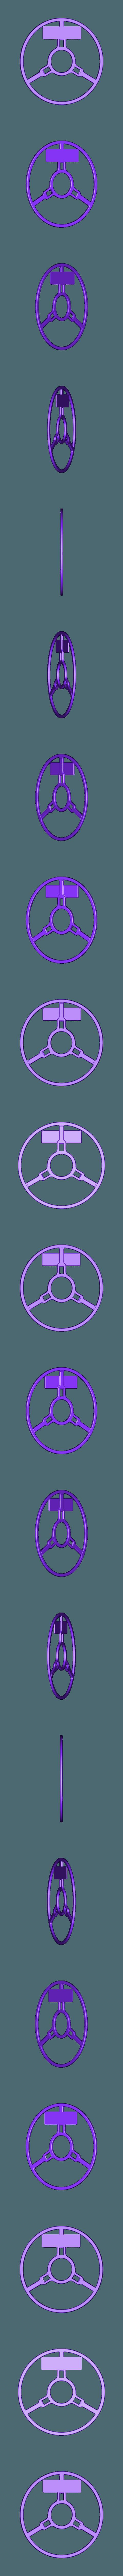 Top_+_Sticker_1.75_mm_filament_200_mm_diameter_v3.stl Download free STL file Little MasterSpool Roller + Sticker (fixed stl, multiple versions, including sourcefile) • 3D print template, kleinerELM